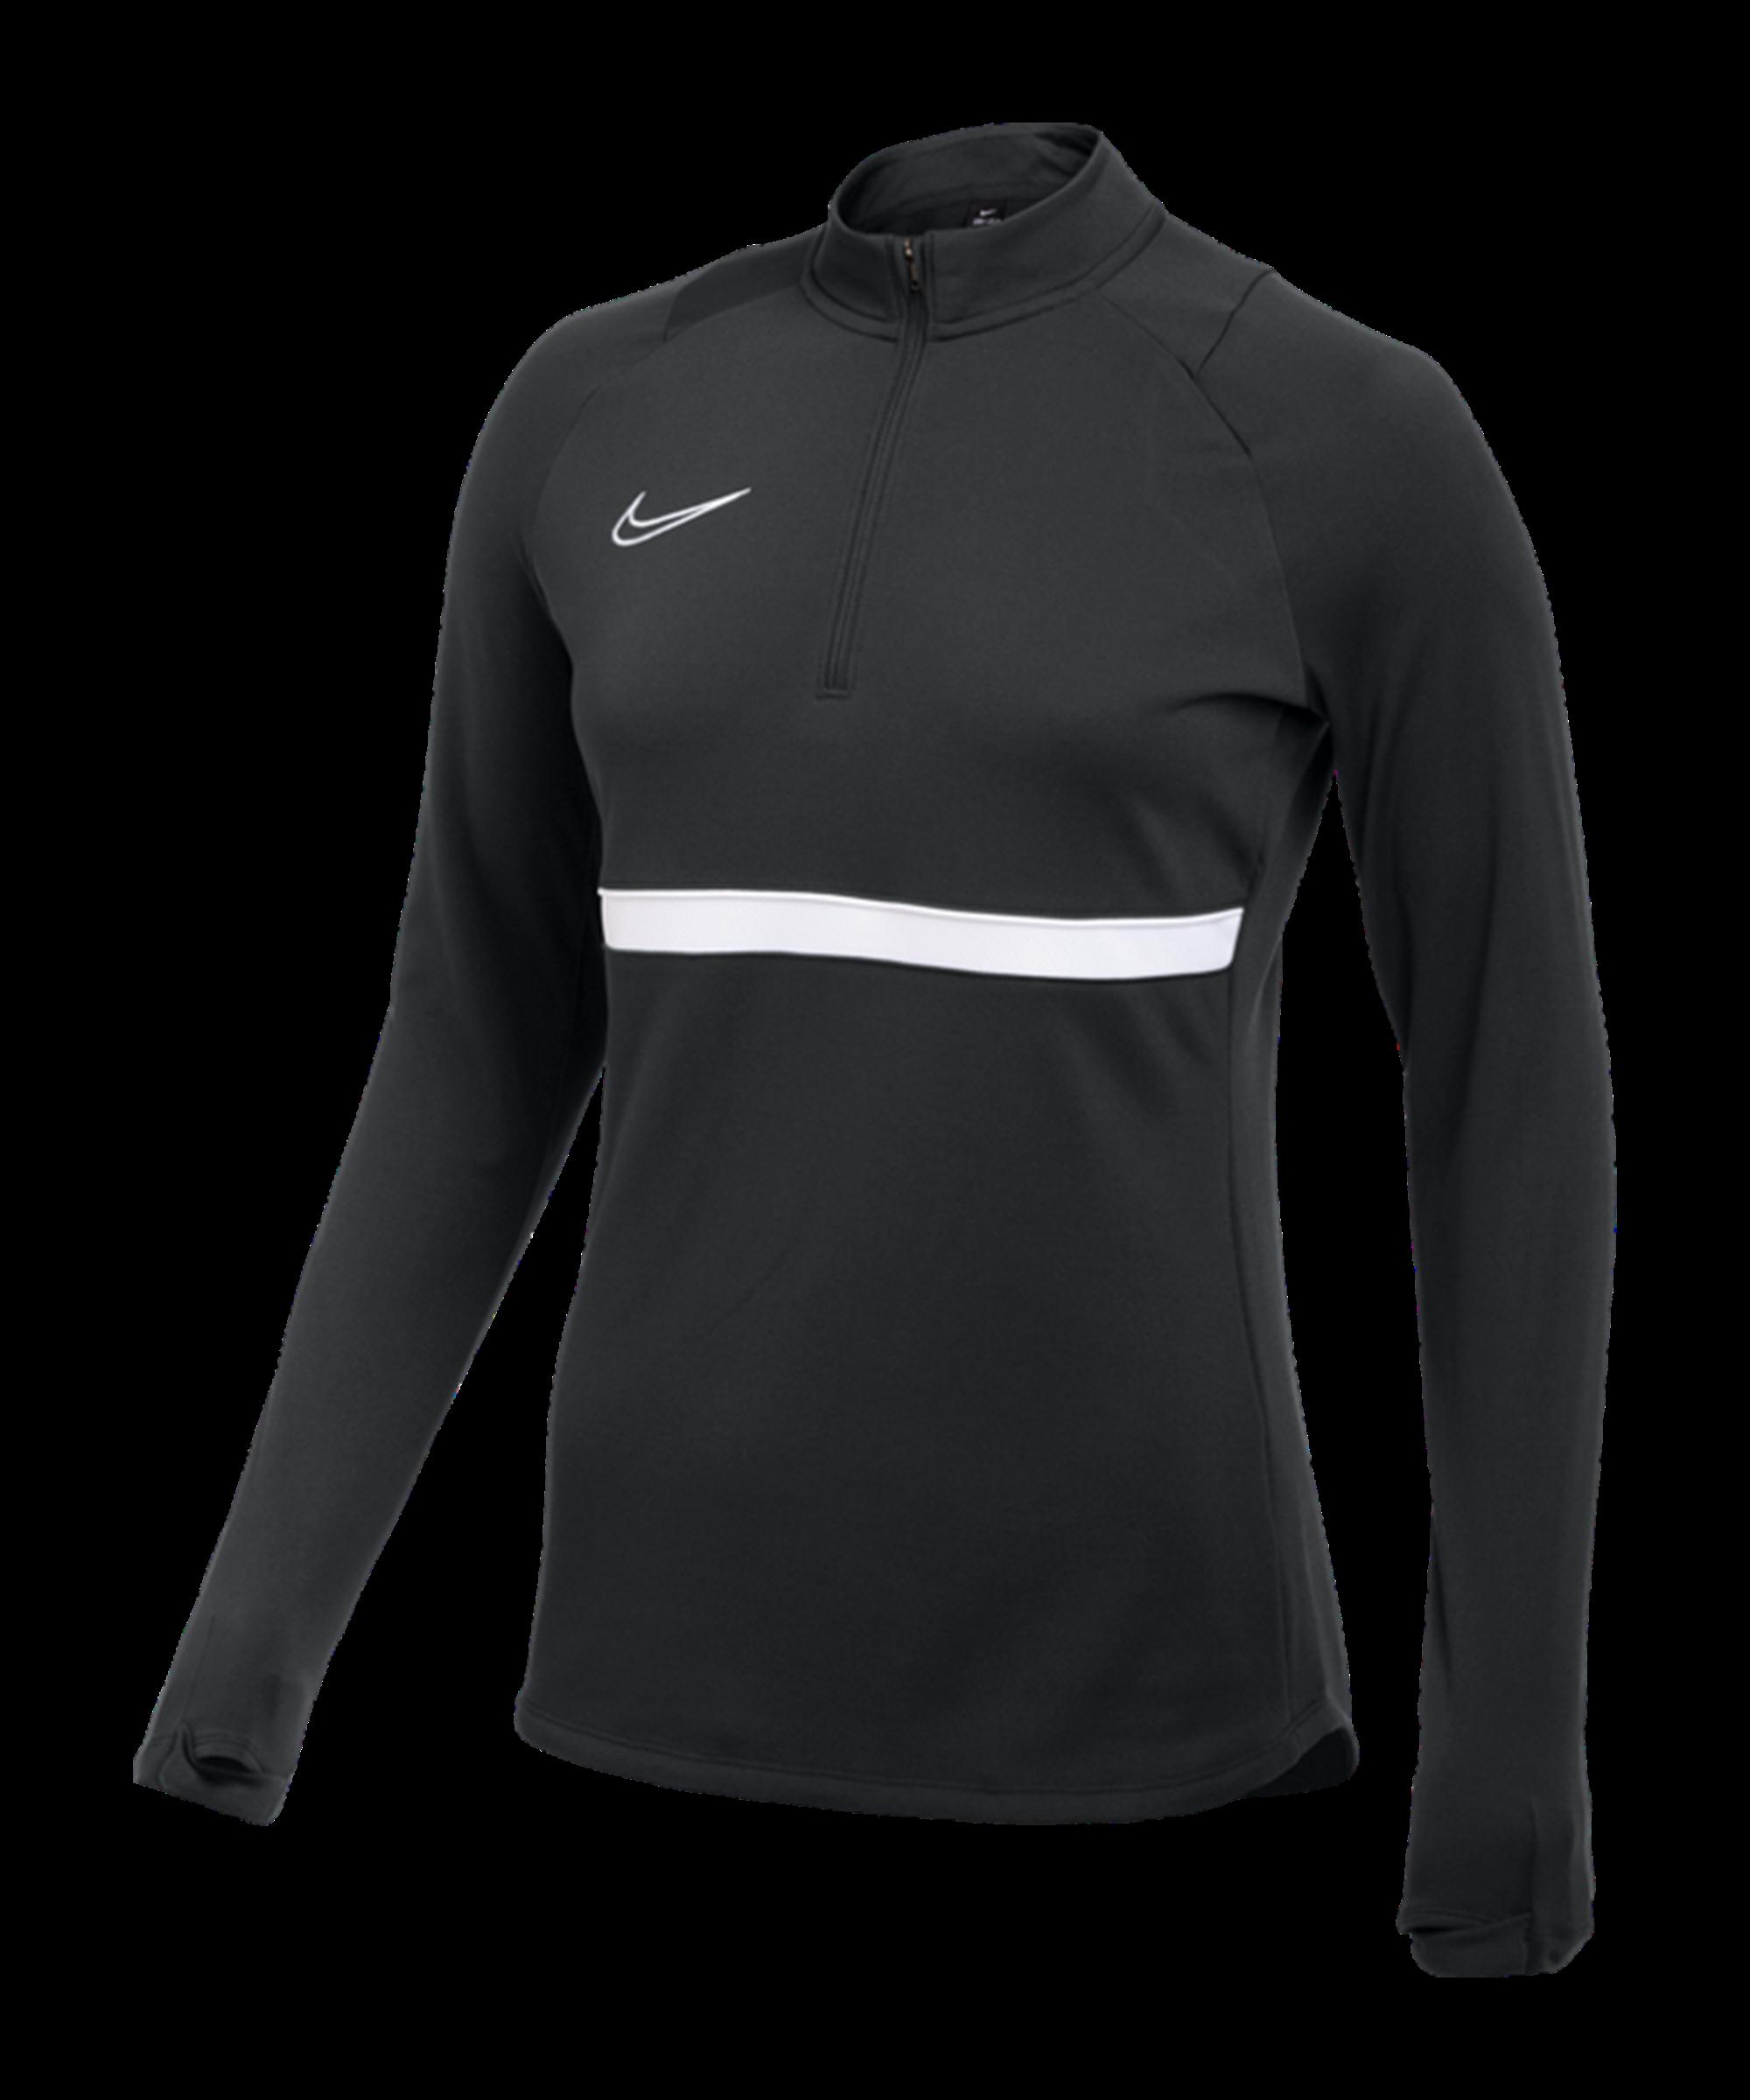 Nike Academy 21 Drill Top Women